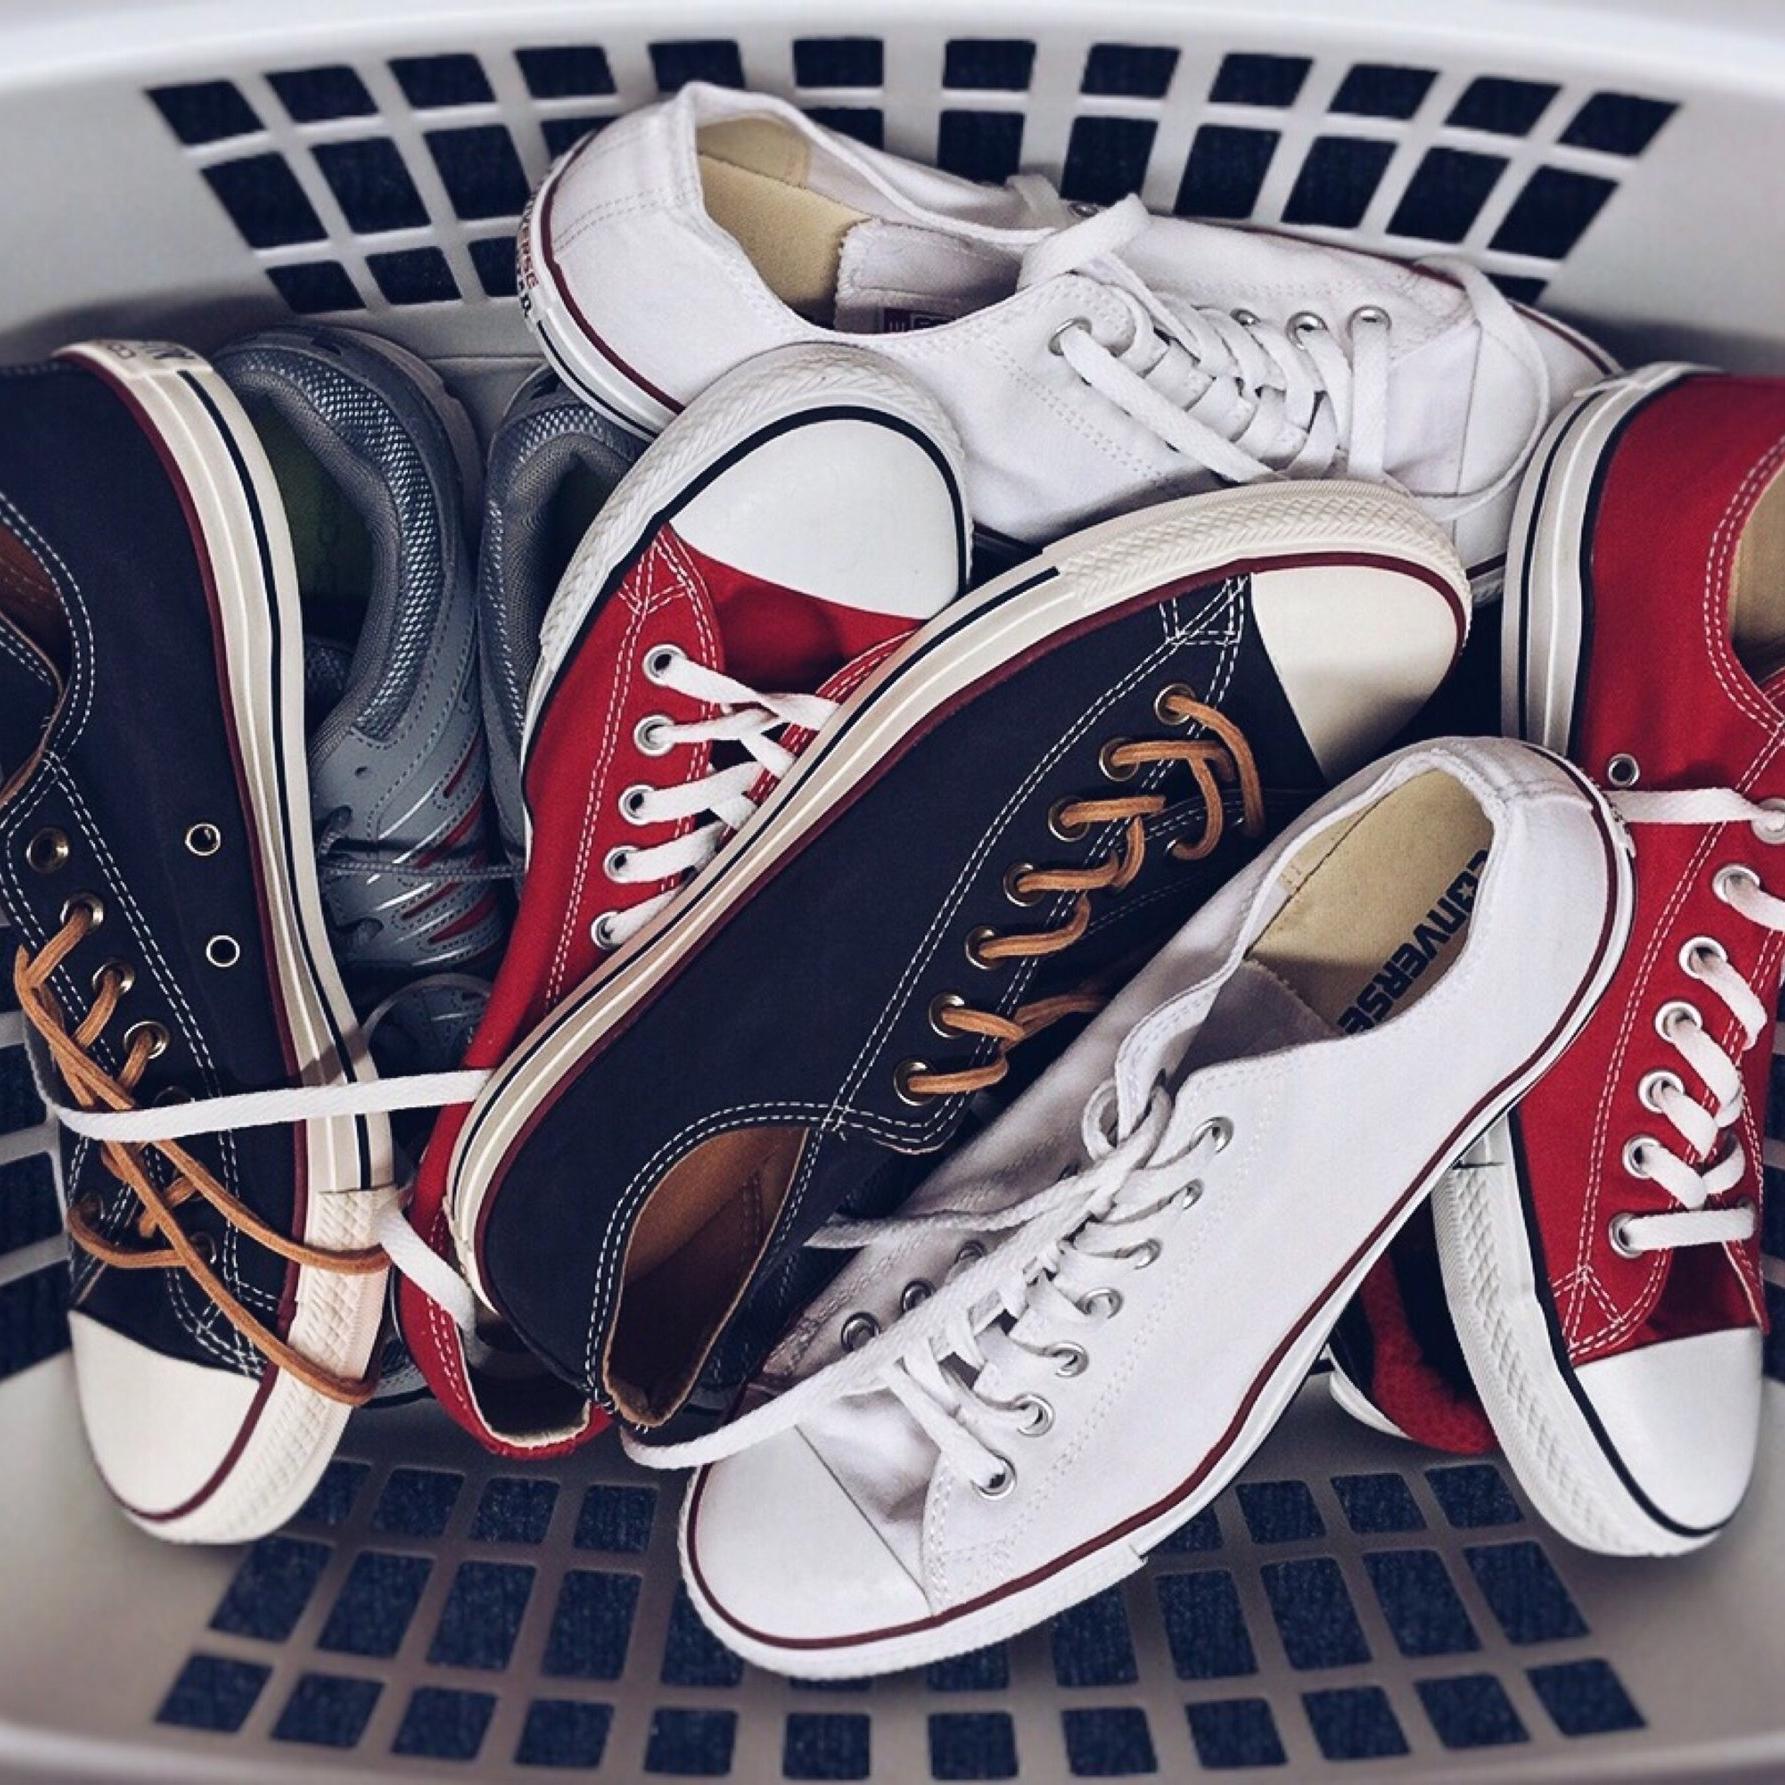 pexels-photo-267202-shoes.jpg